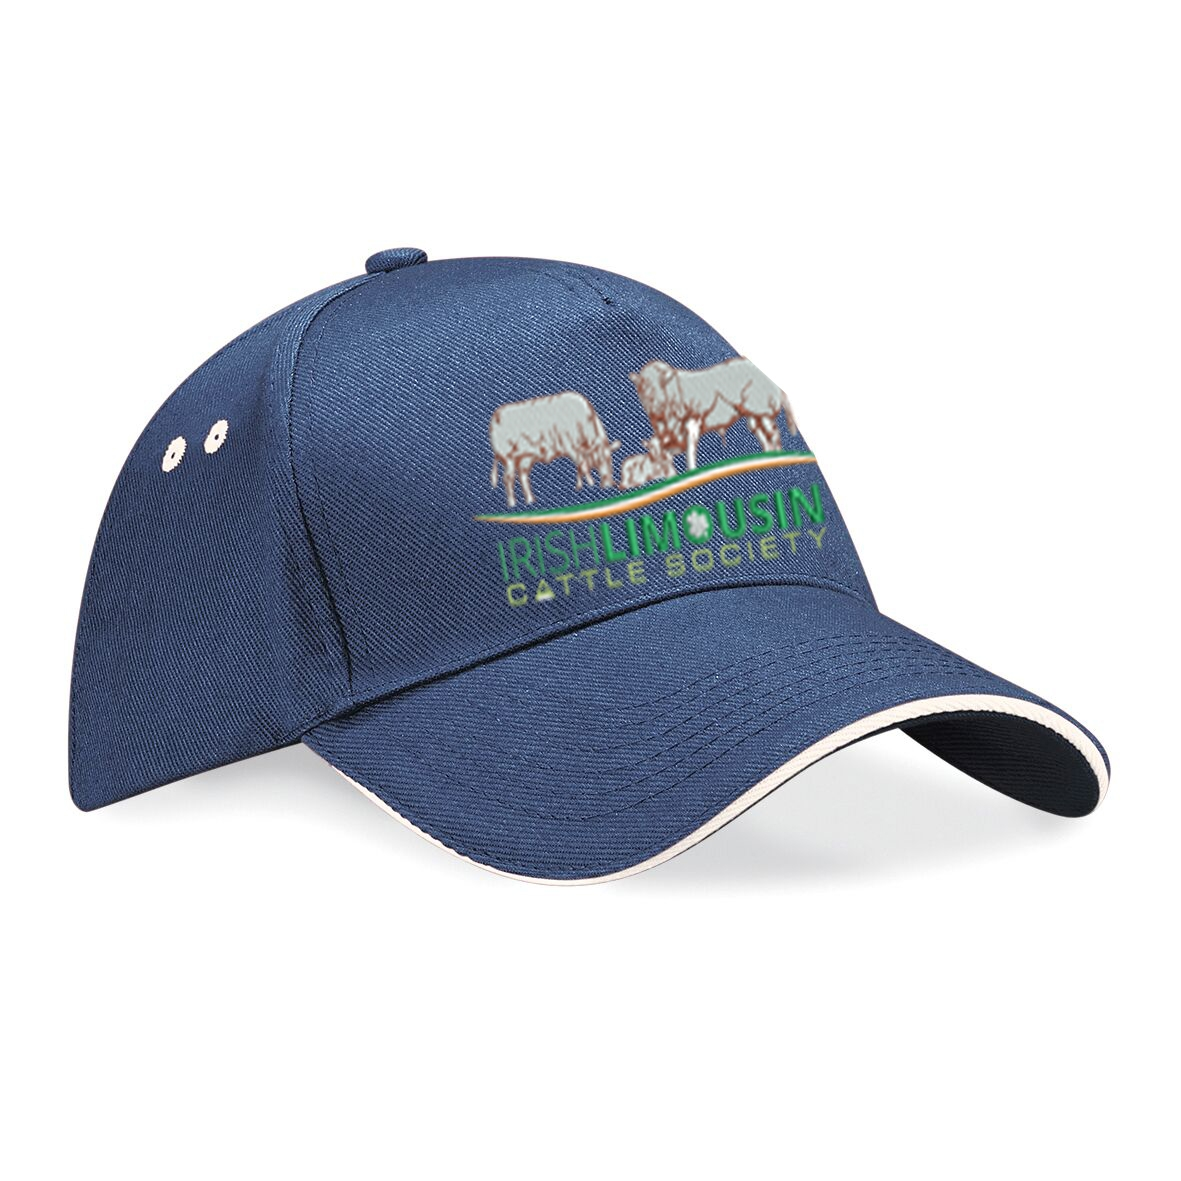 Irish Limousin Cattle Society Baseball Cap